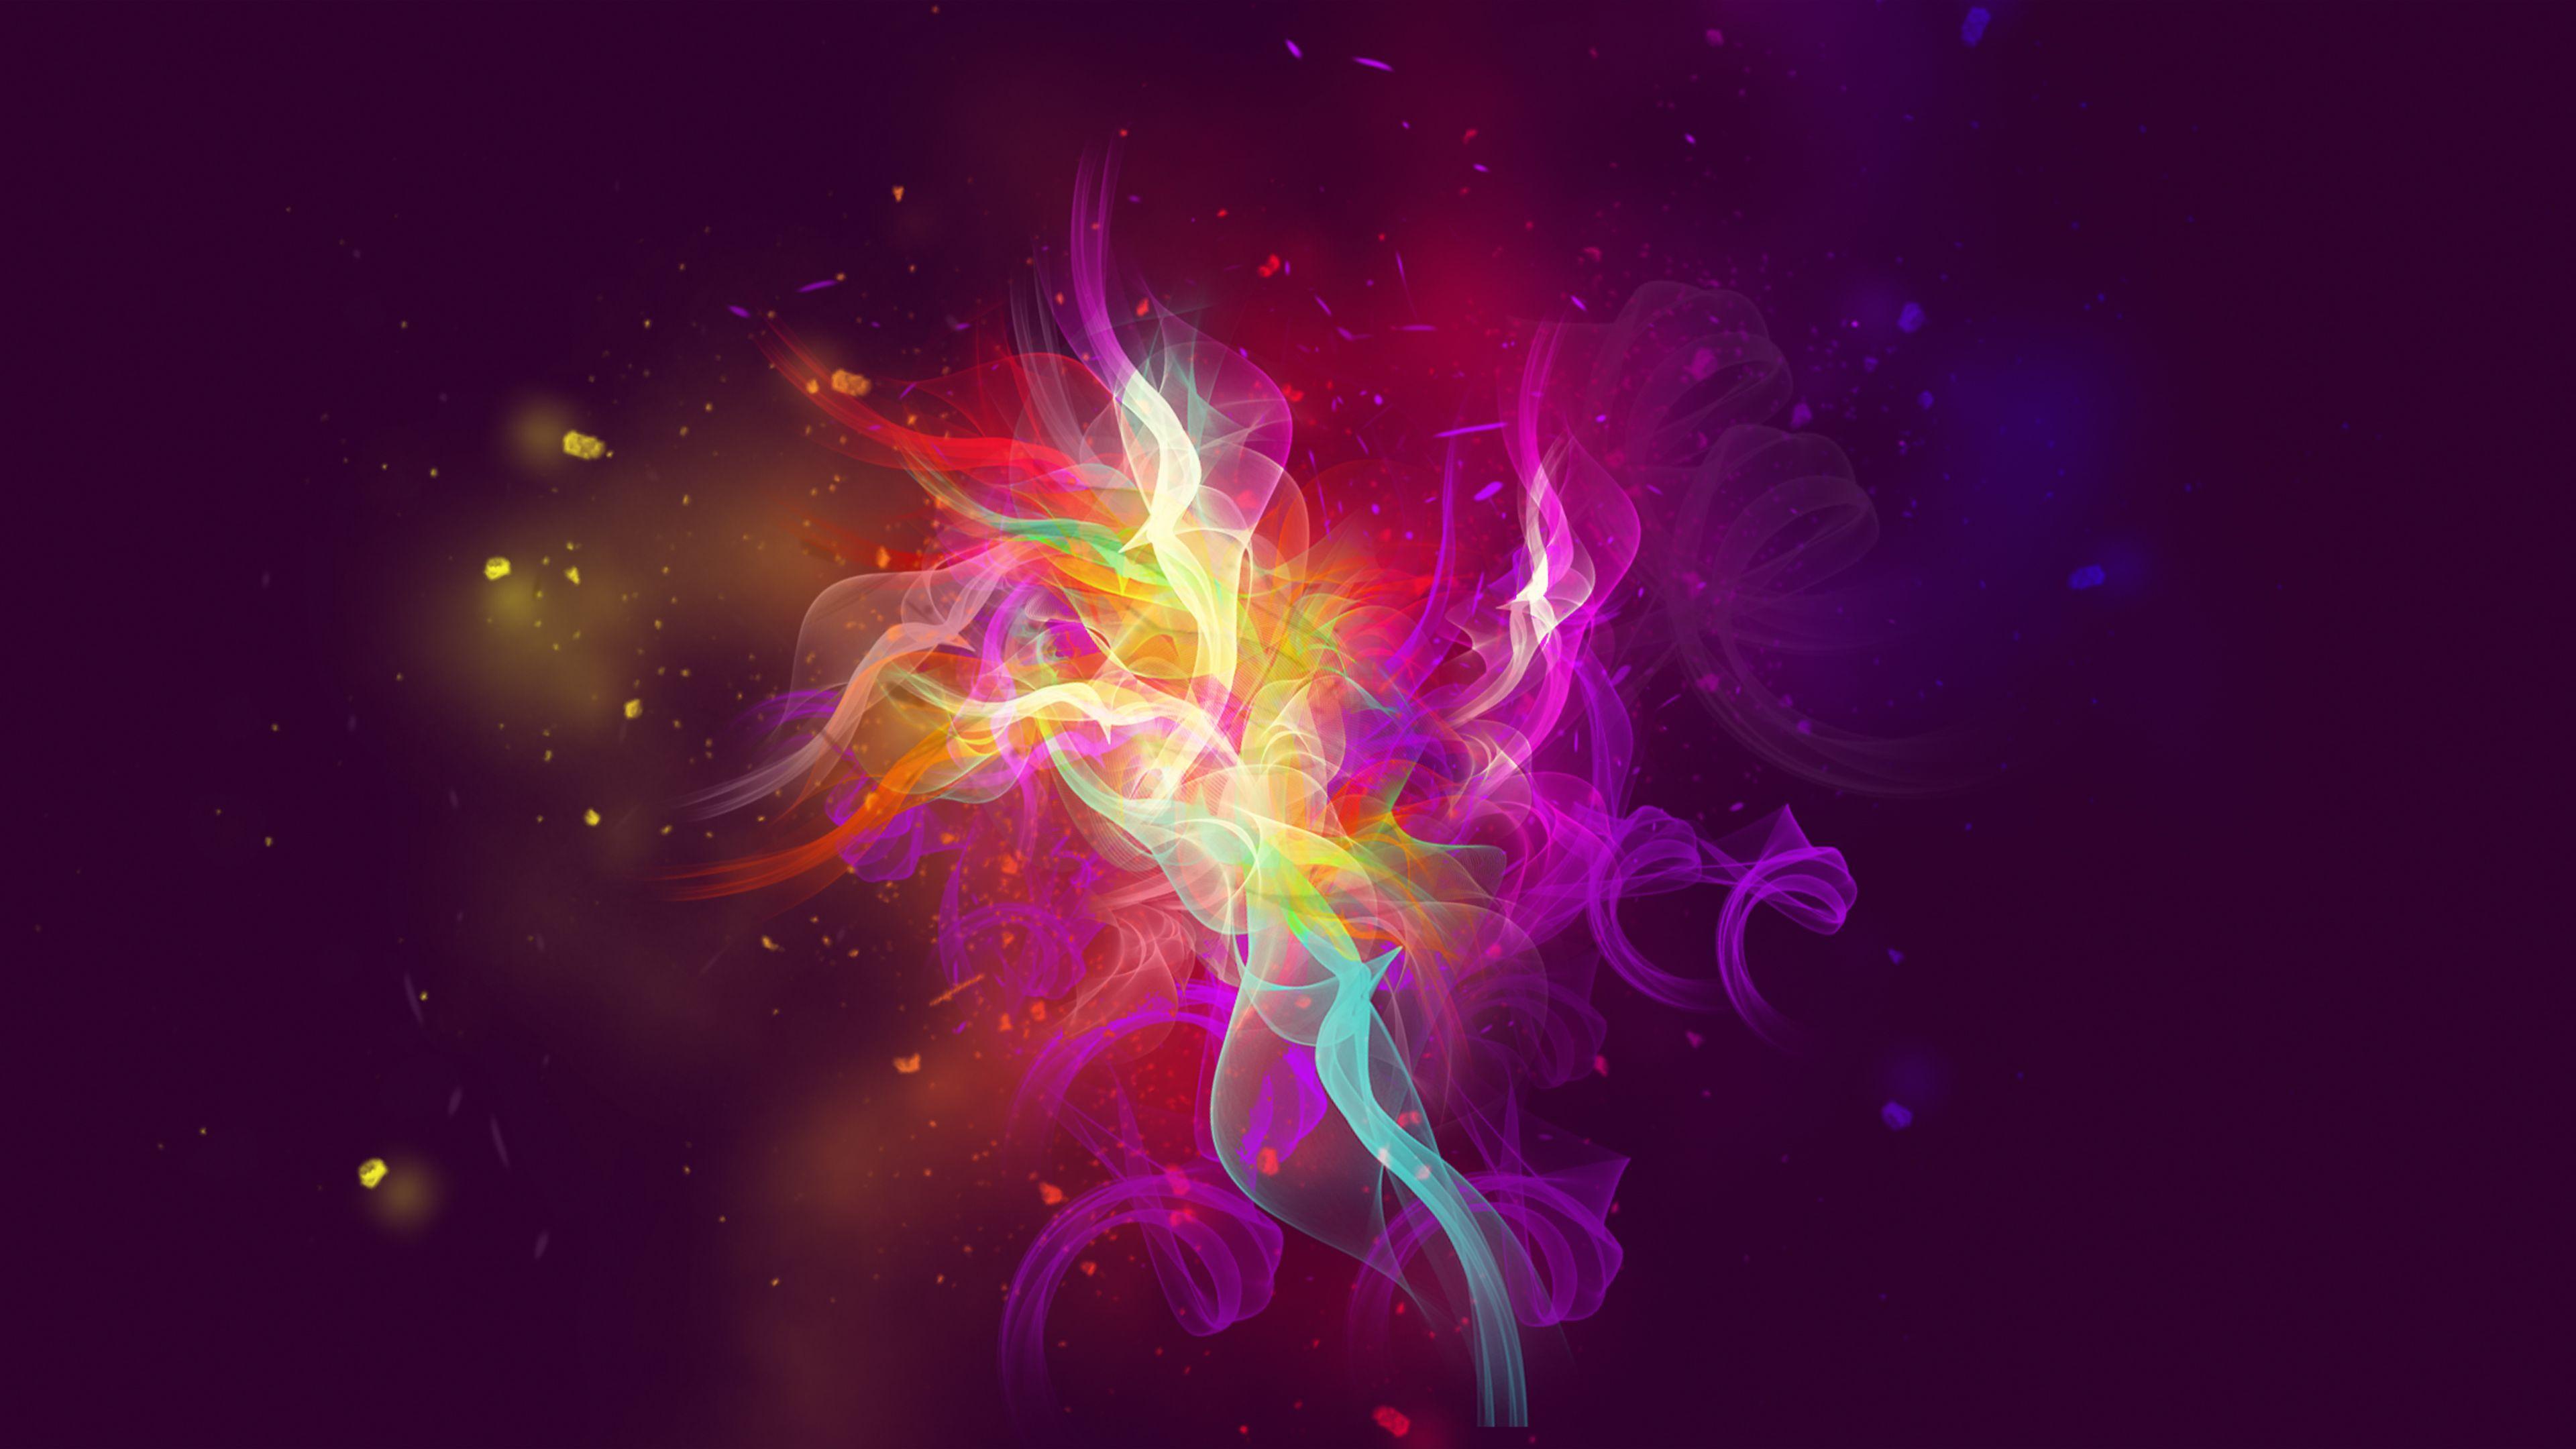 Color Smoke Color Smoke Wallpapers Color Smoke 4k Wallpapers Smoke Wallpaper Smoke Color Wallpaper